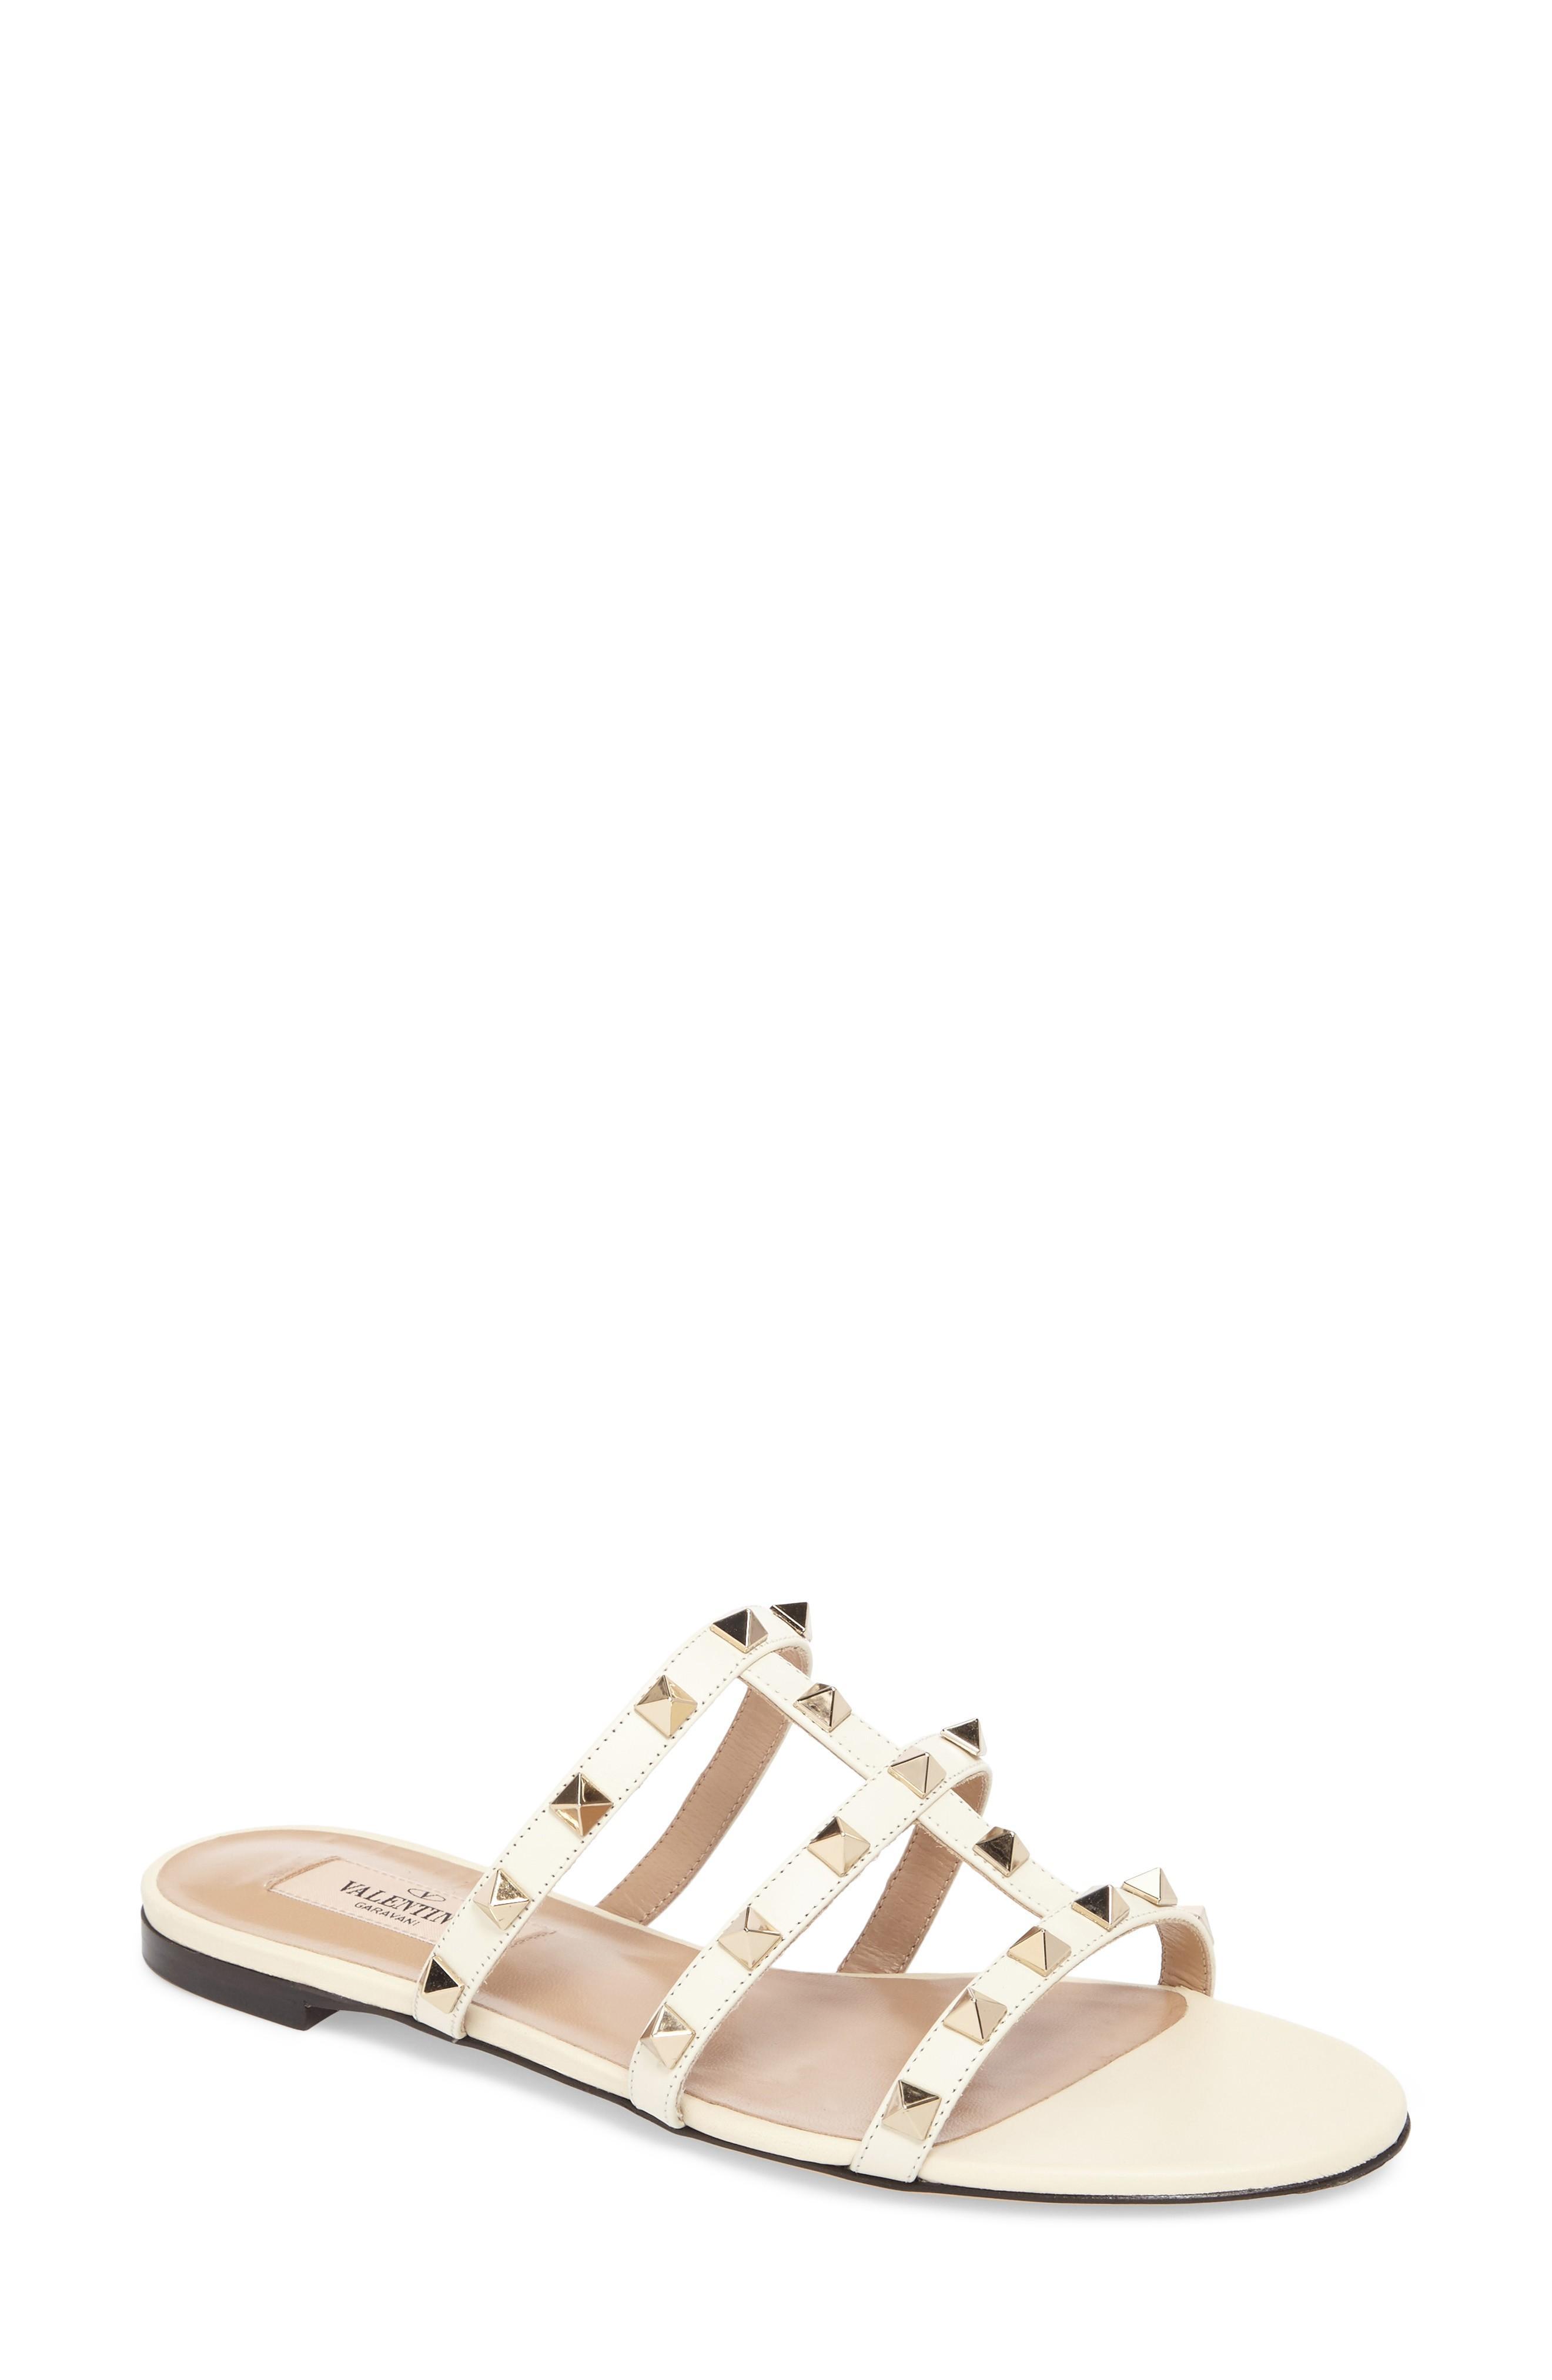 402072d1321 Valentino Rockstud Slide Sandal In Light Ivory